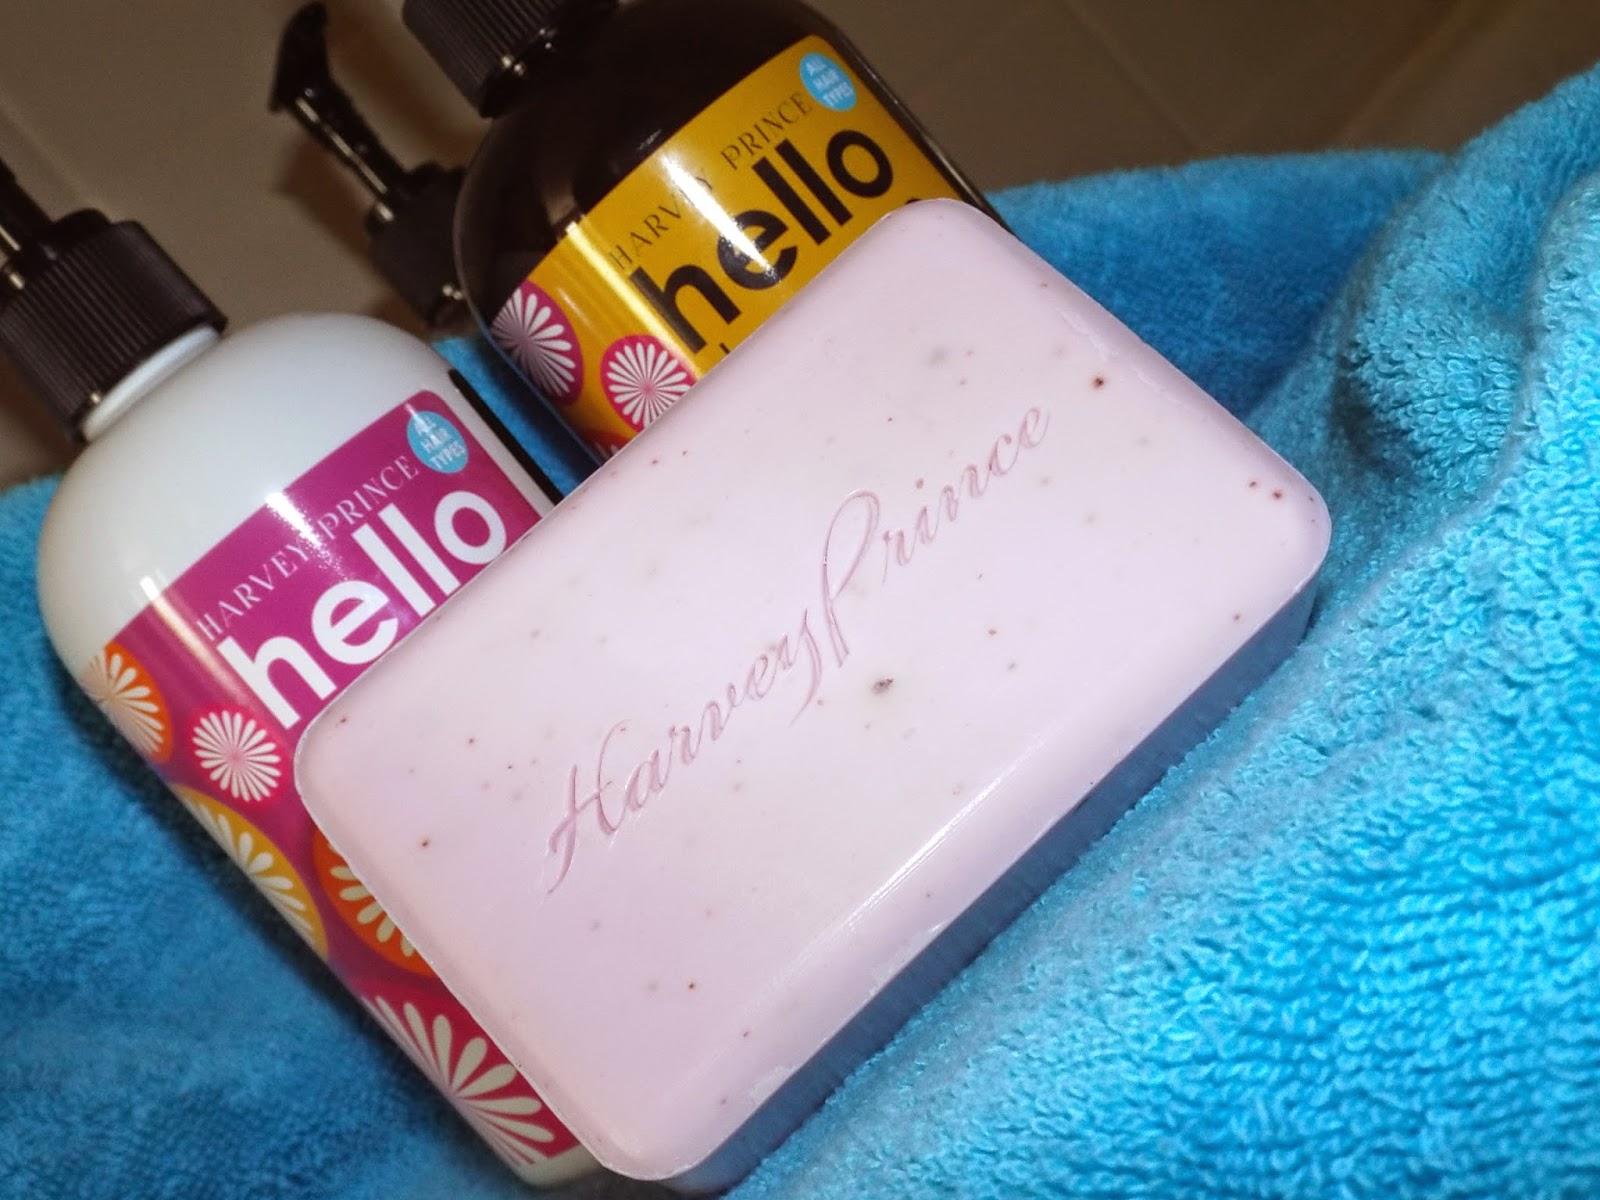 Harvey Prince Shampoo & Conditioner